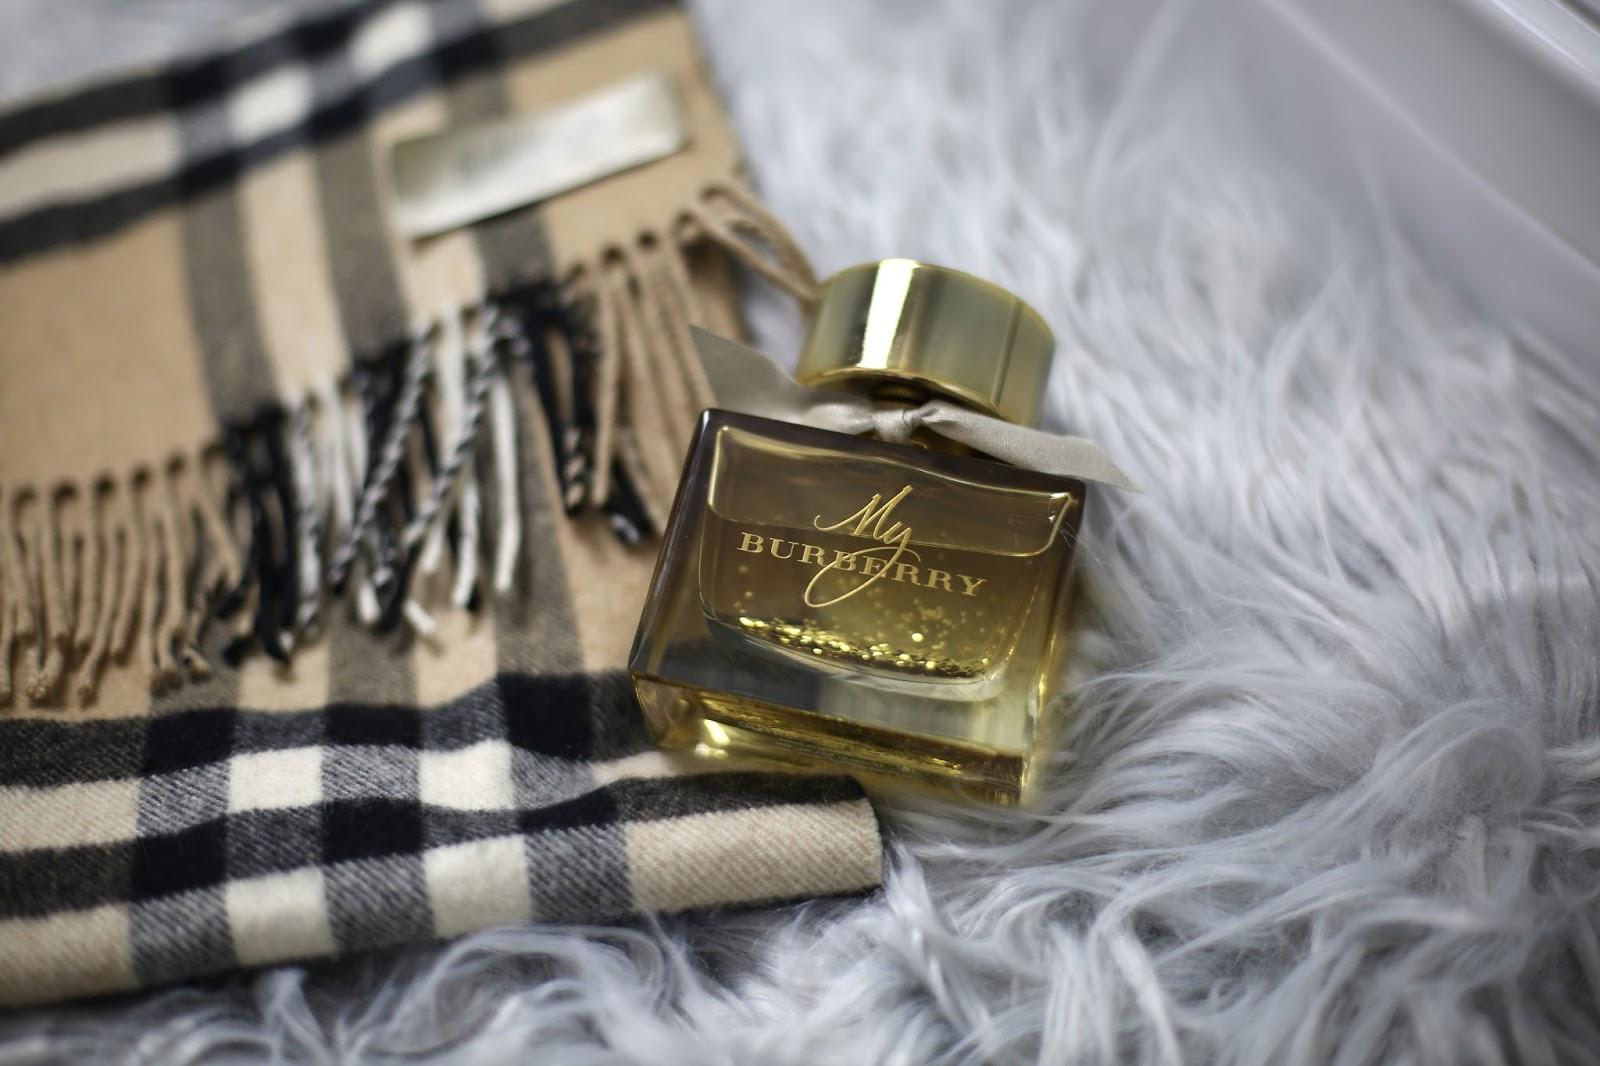 sparkly glitter my burberry perfume